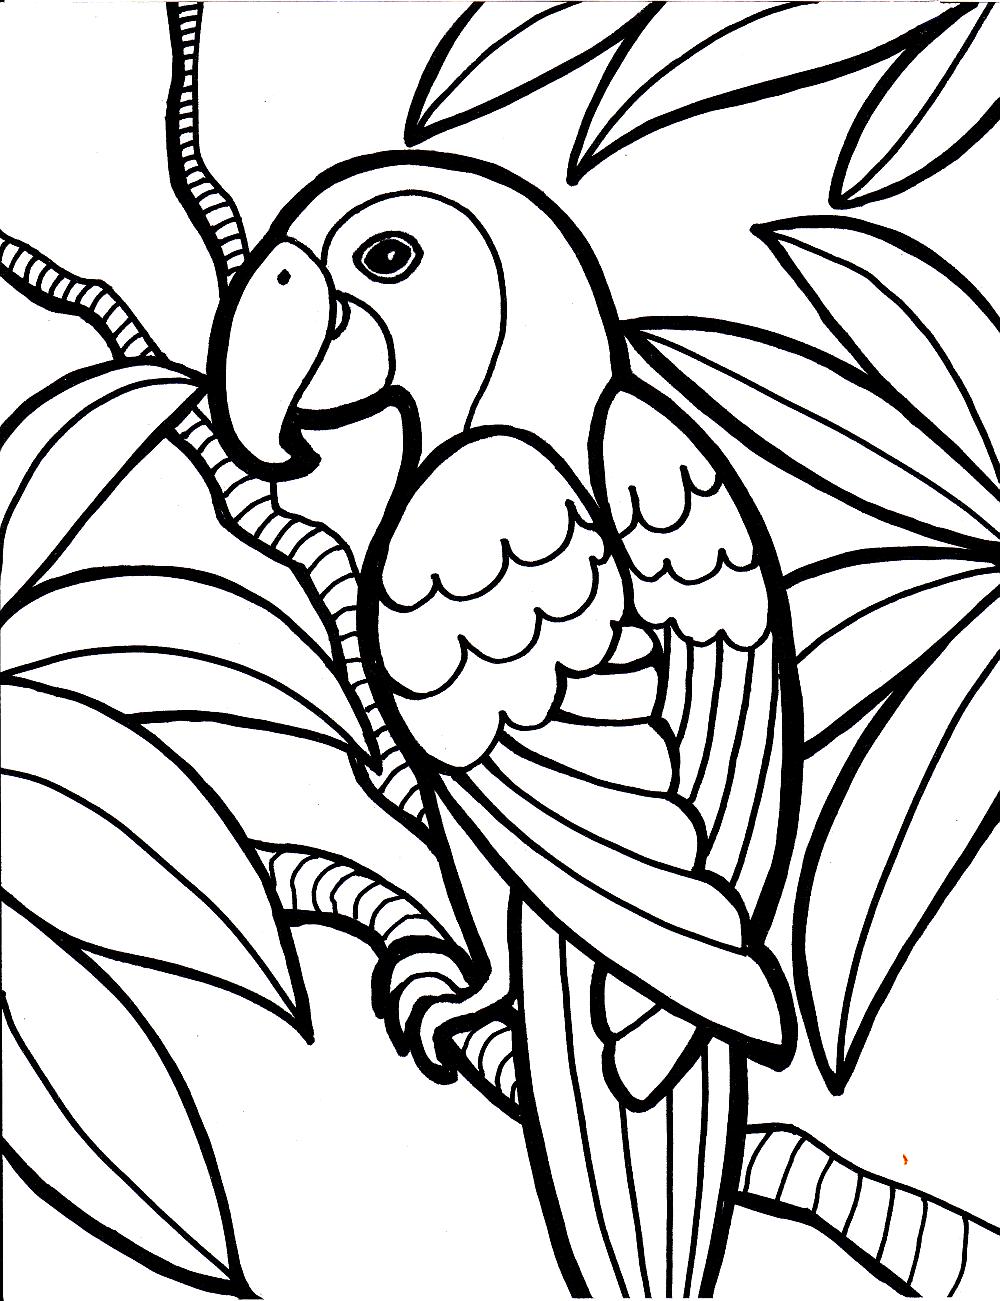 Encantador Loro Para Colorear Imprimible Fotos - Dibujos Para ...